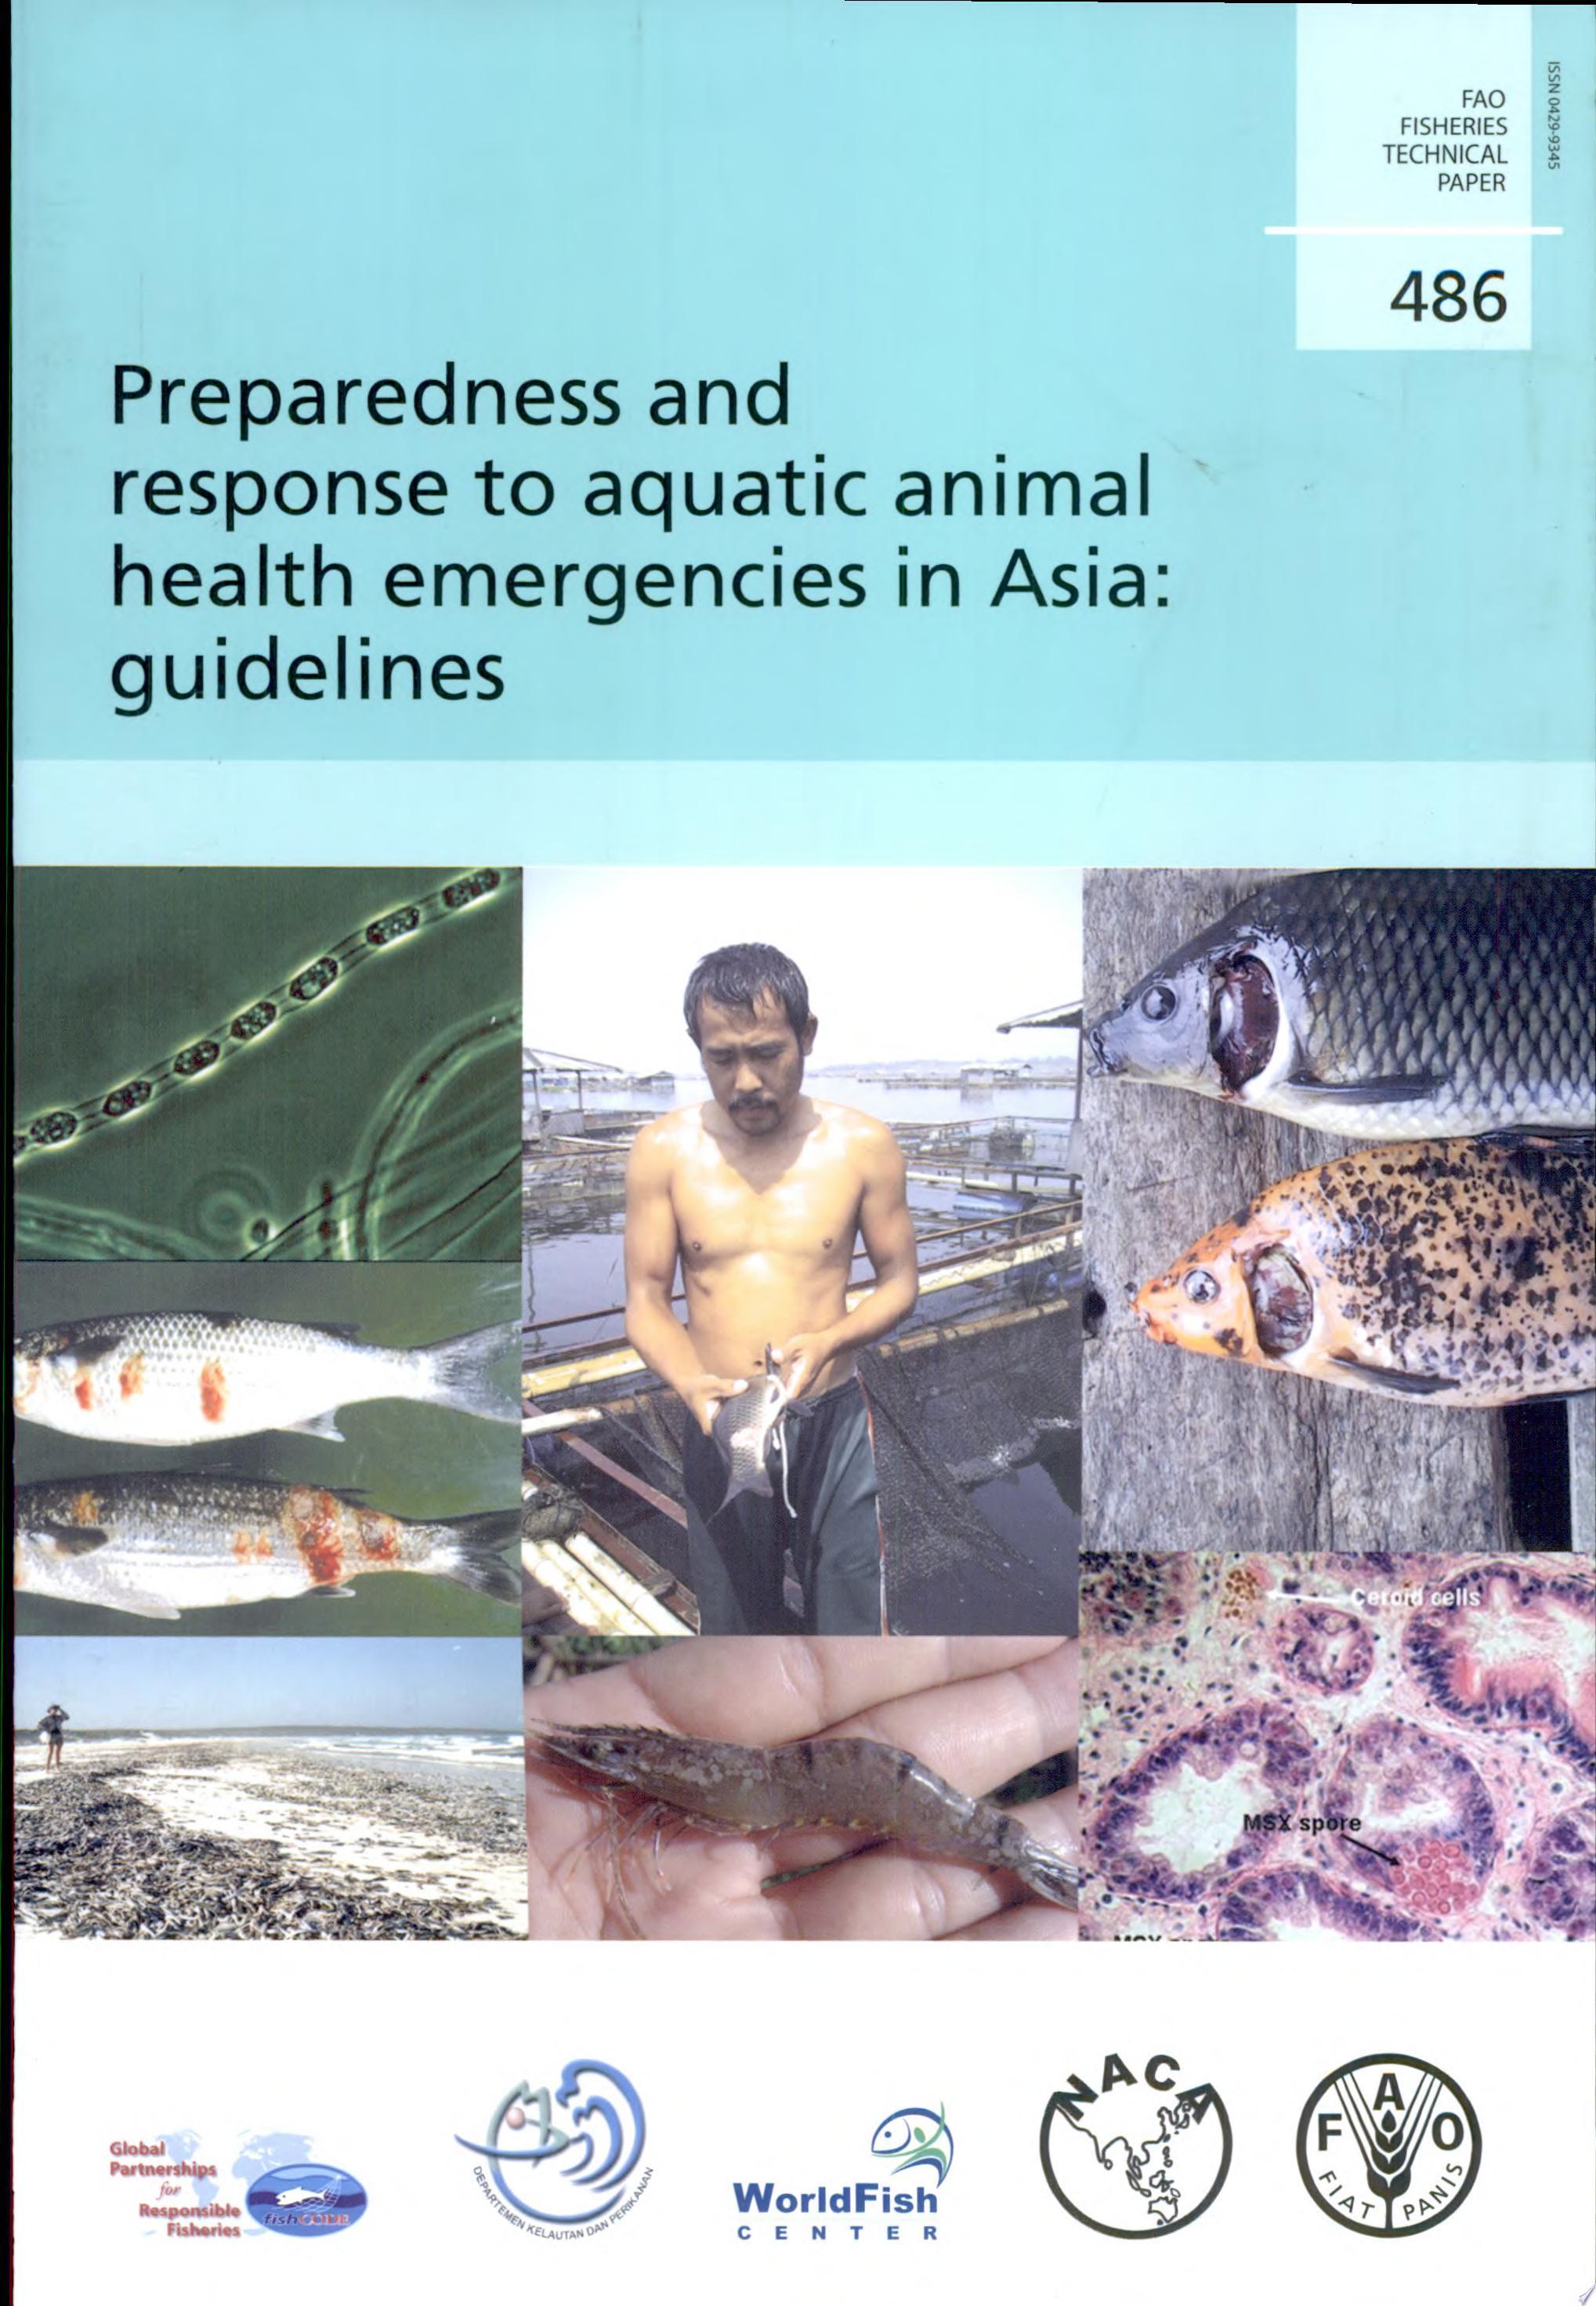 Preparedness and Response to Aquatic Animal Health Emergencies in Asia